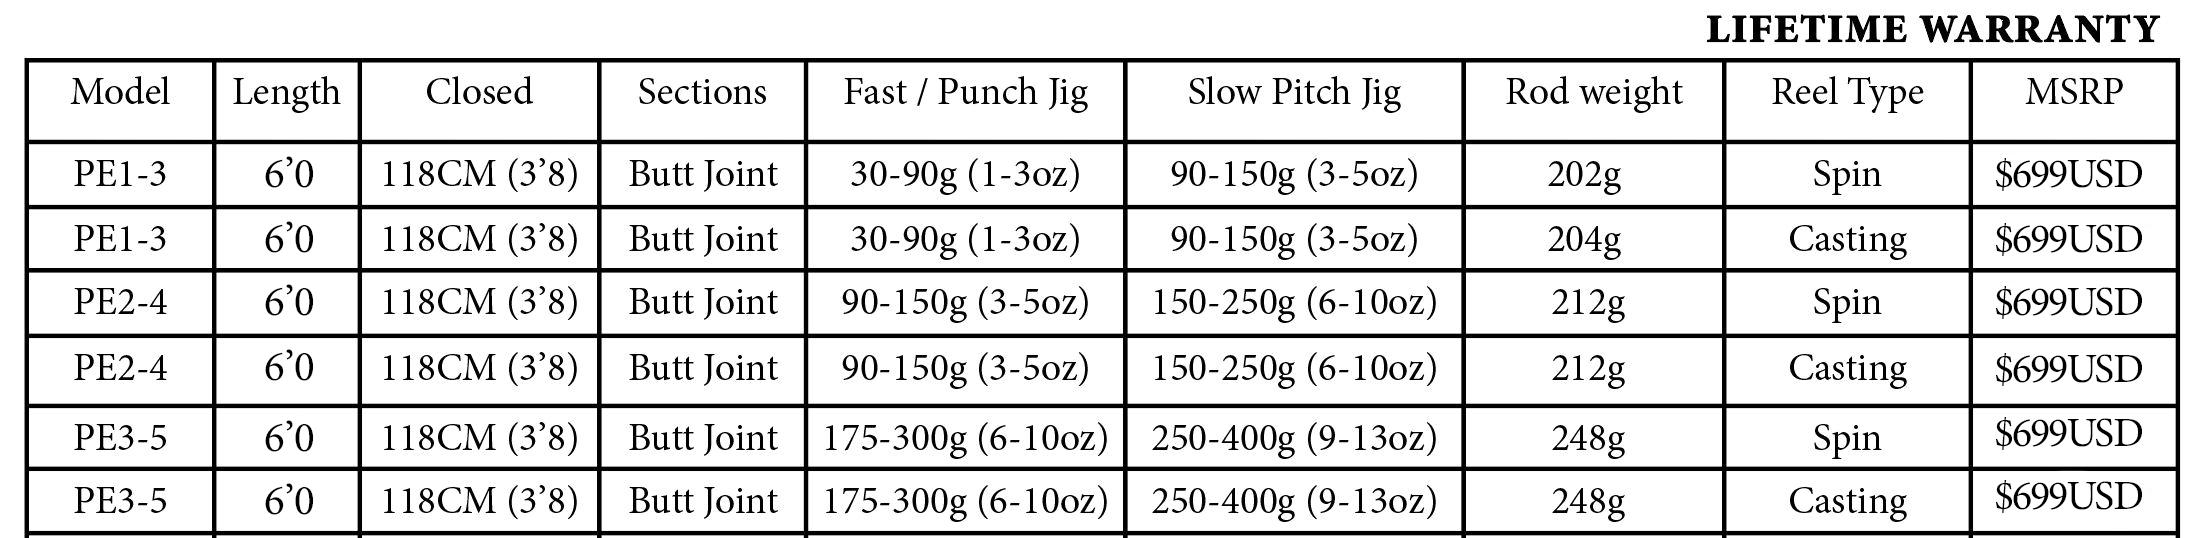 slow-fast-xos-2020-2112.jpg